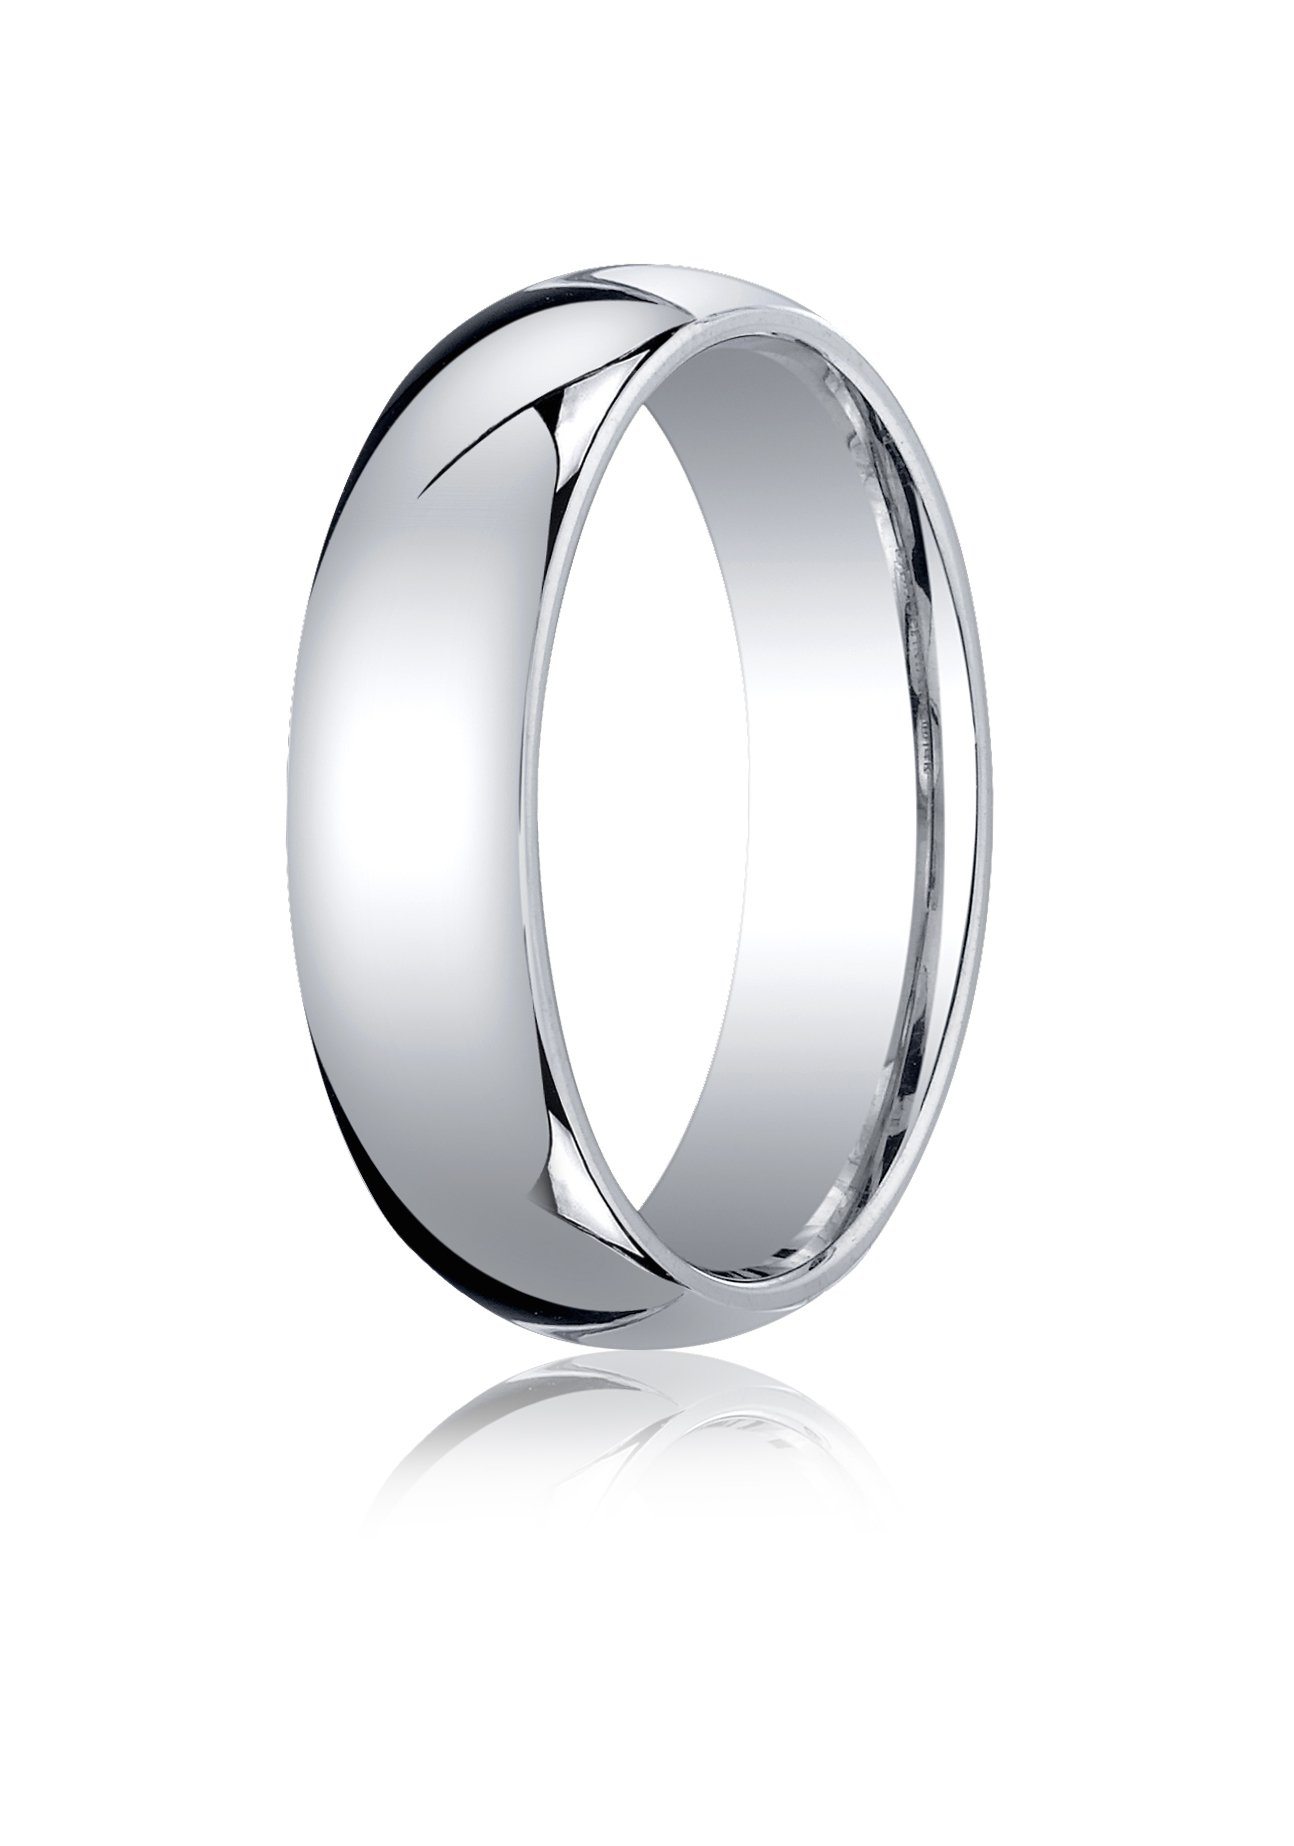 Mens 10K White Gold, 6mm Slightly Domed Standard Comfort-Fit Ring (sz 7.5)